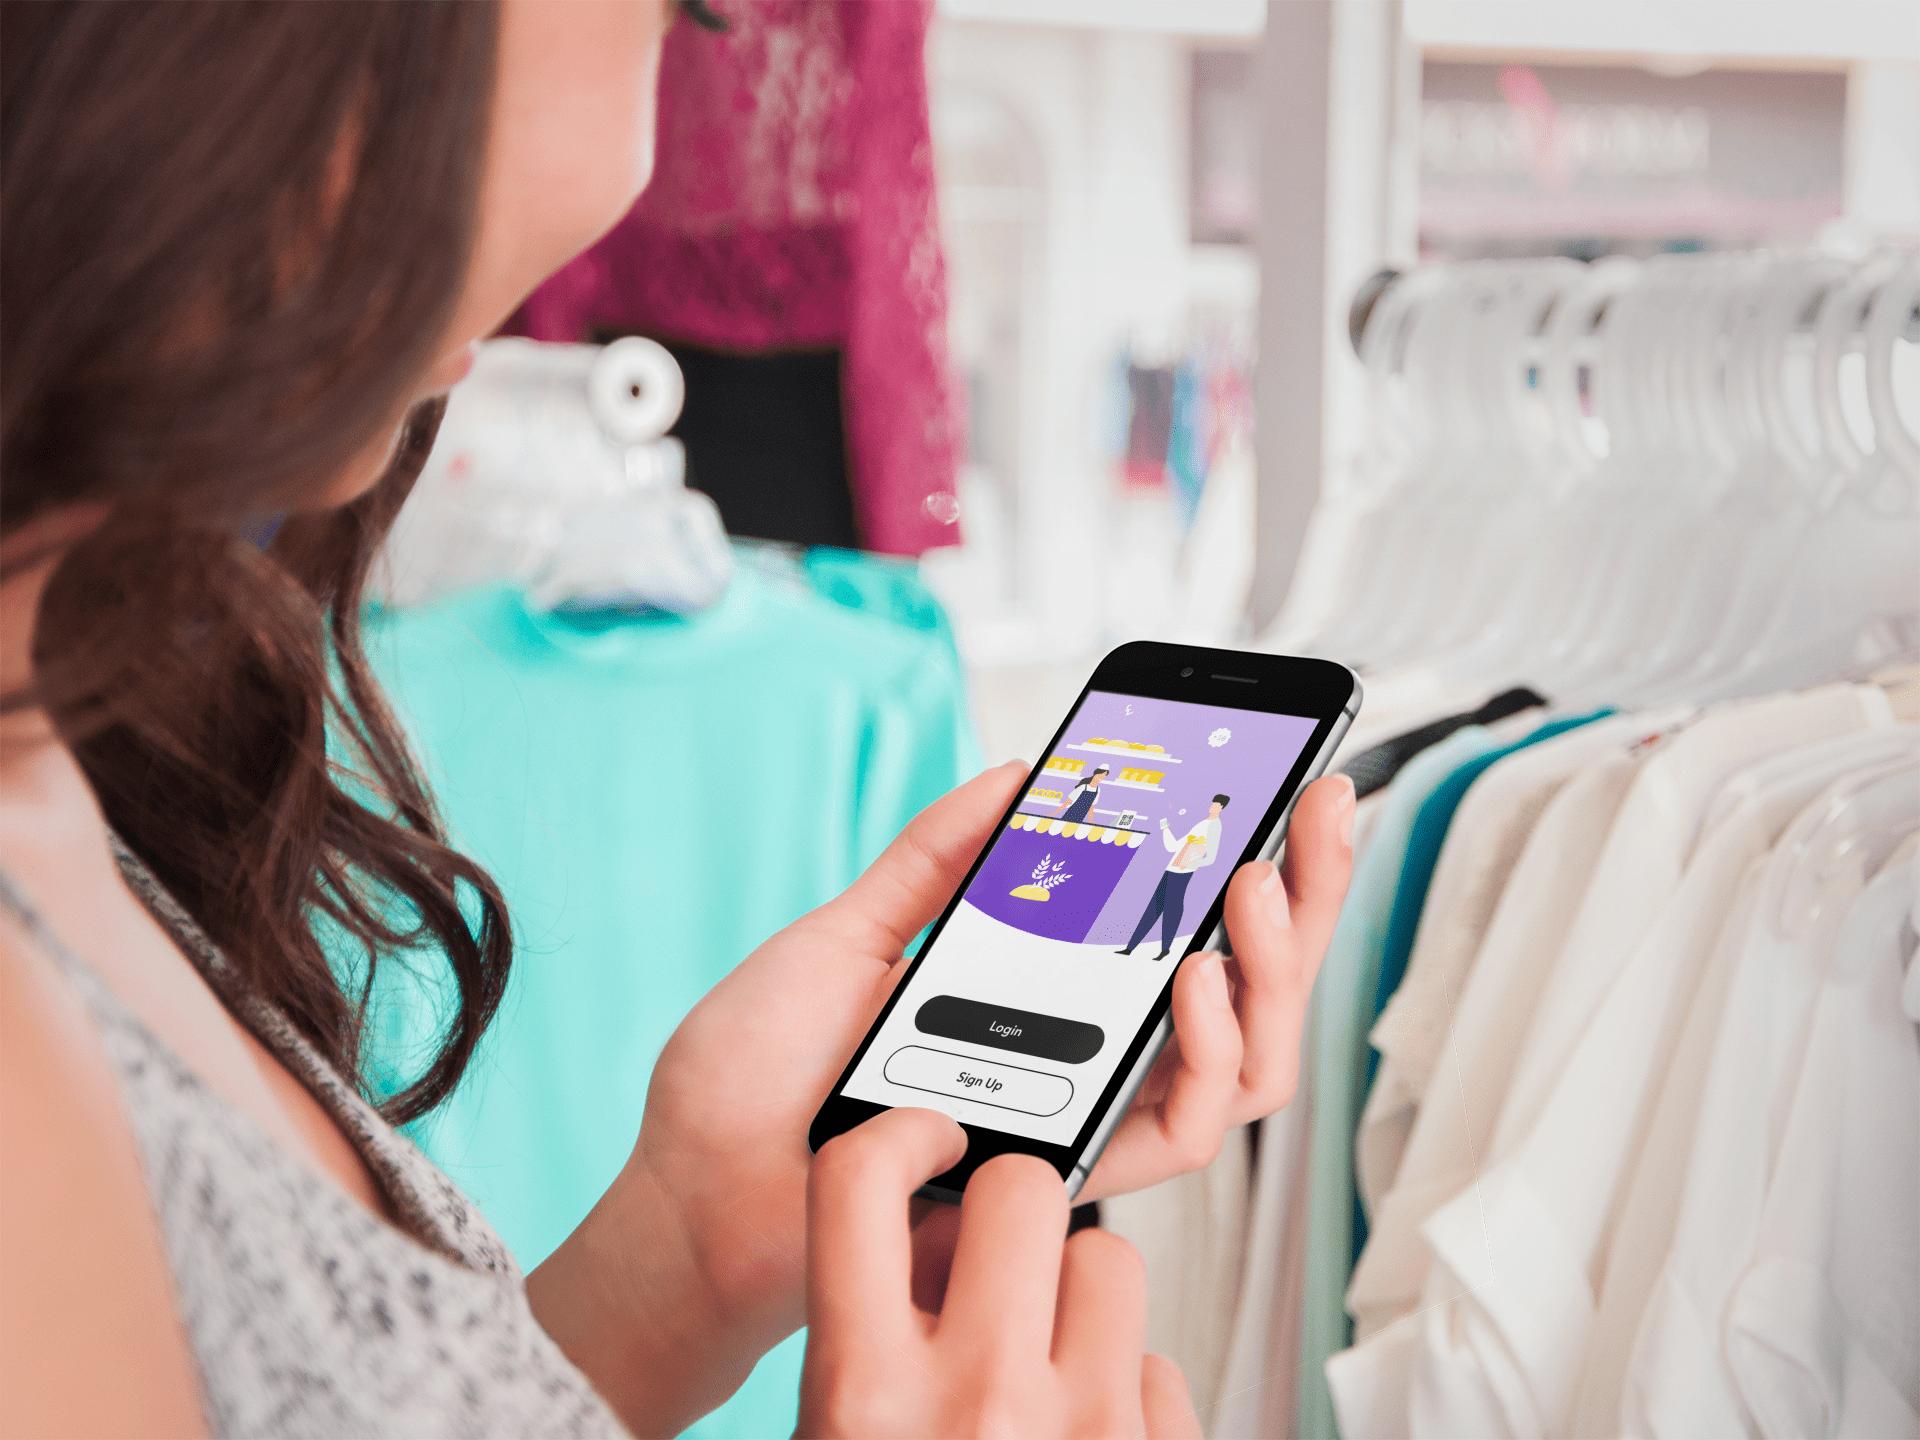 AIO App Girl Holding Phone with App